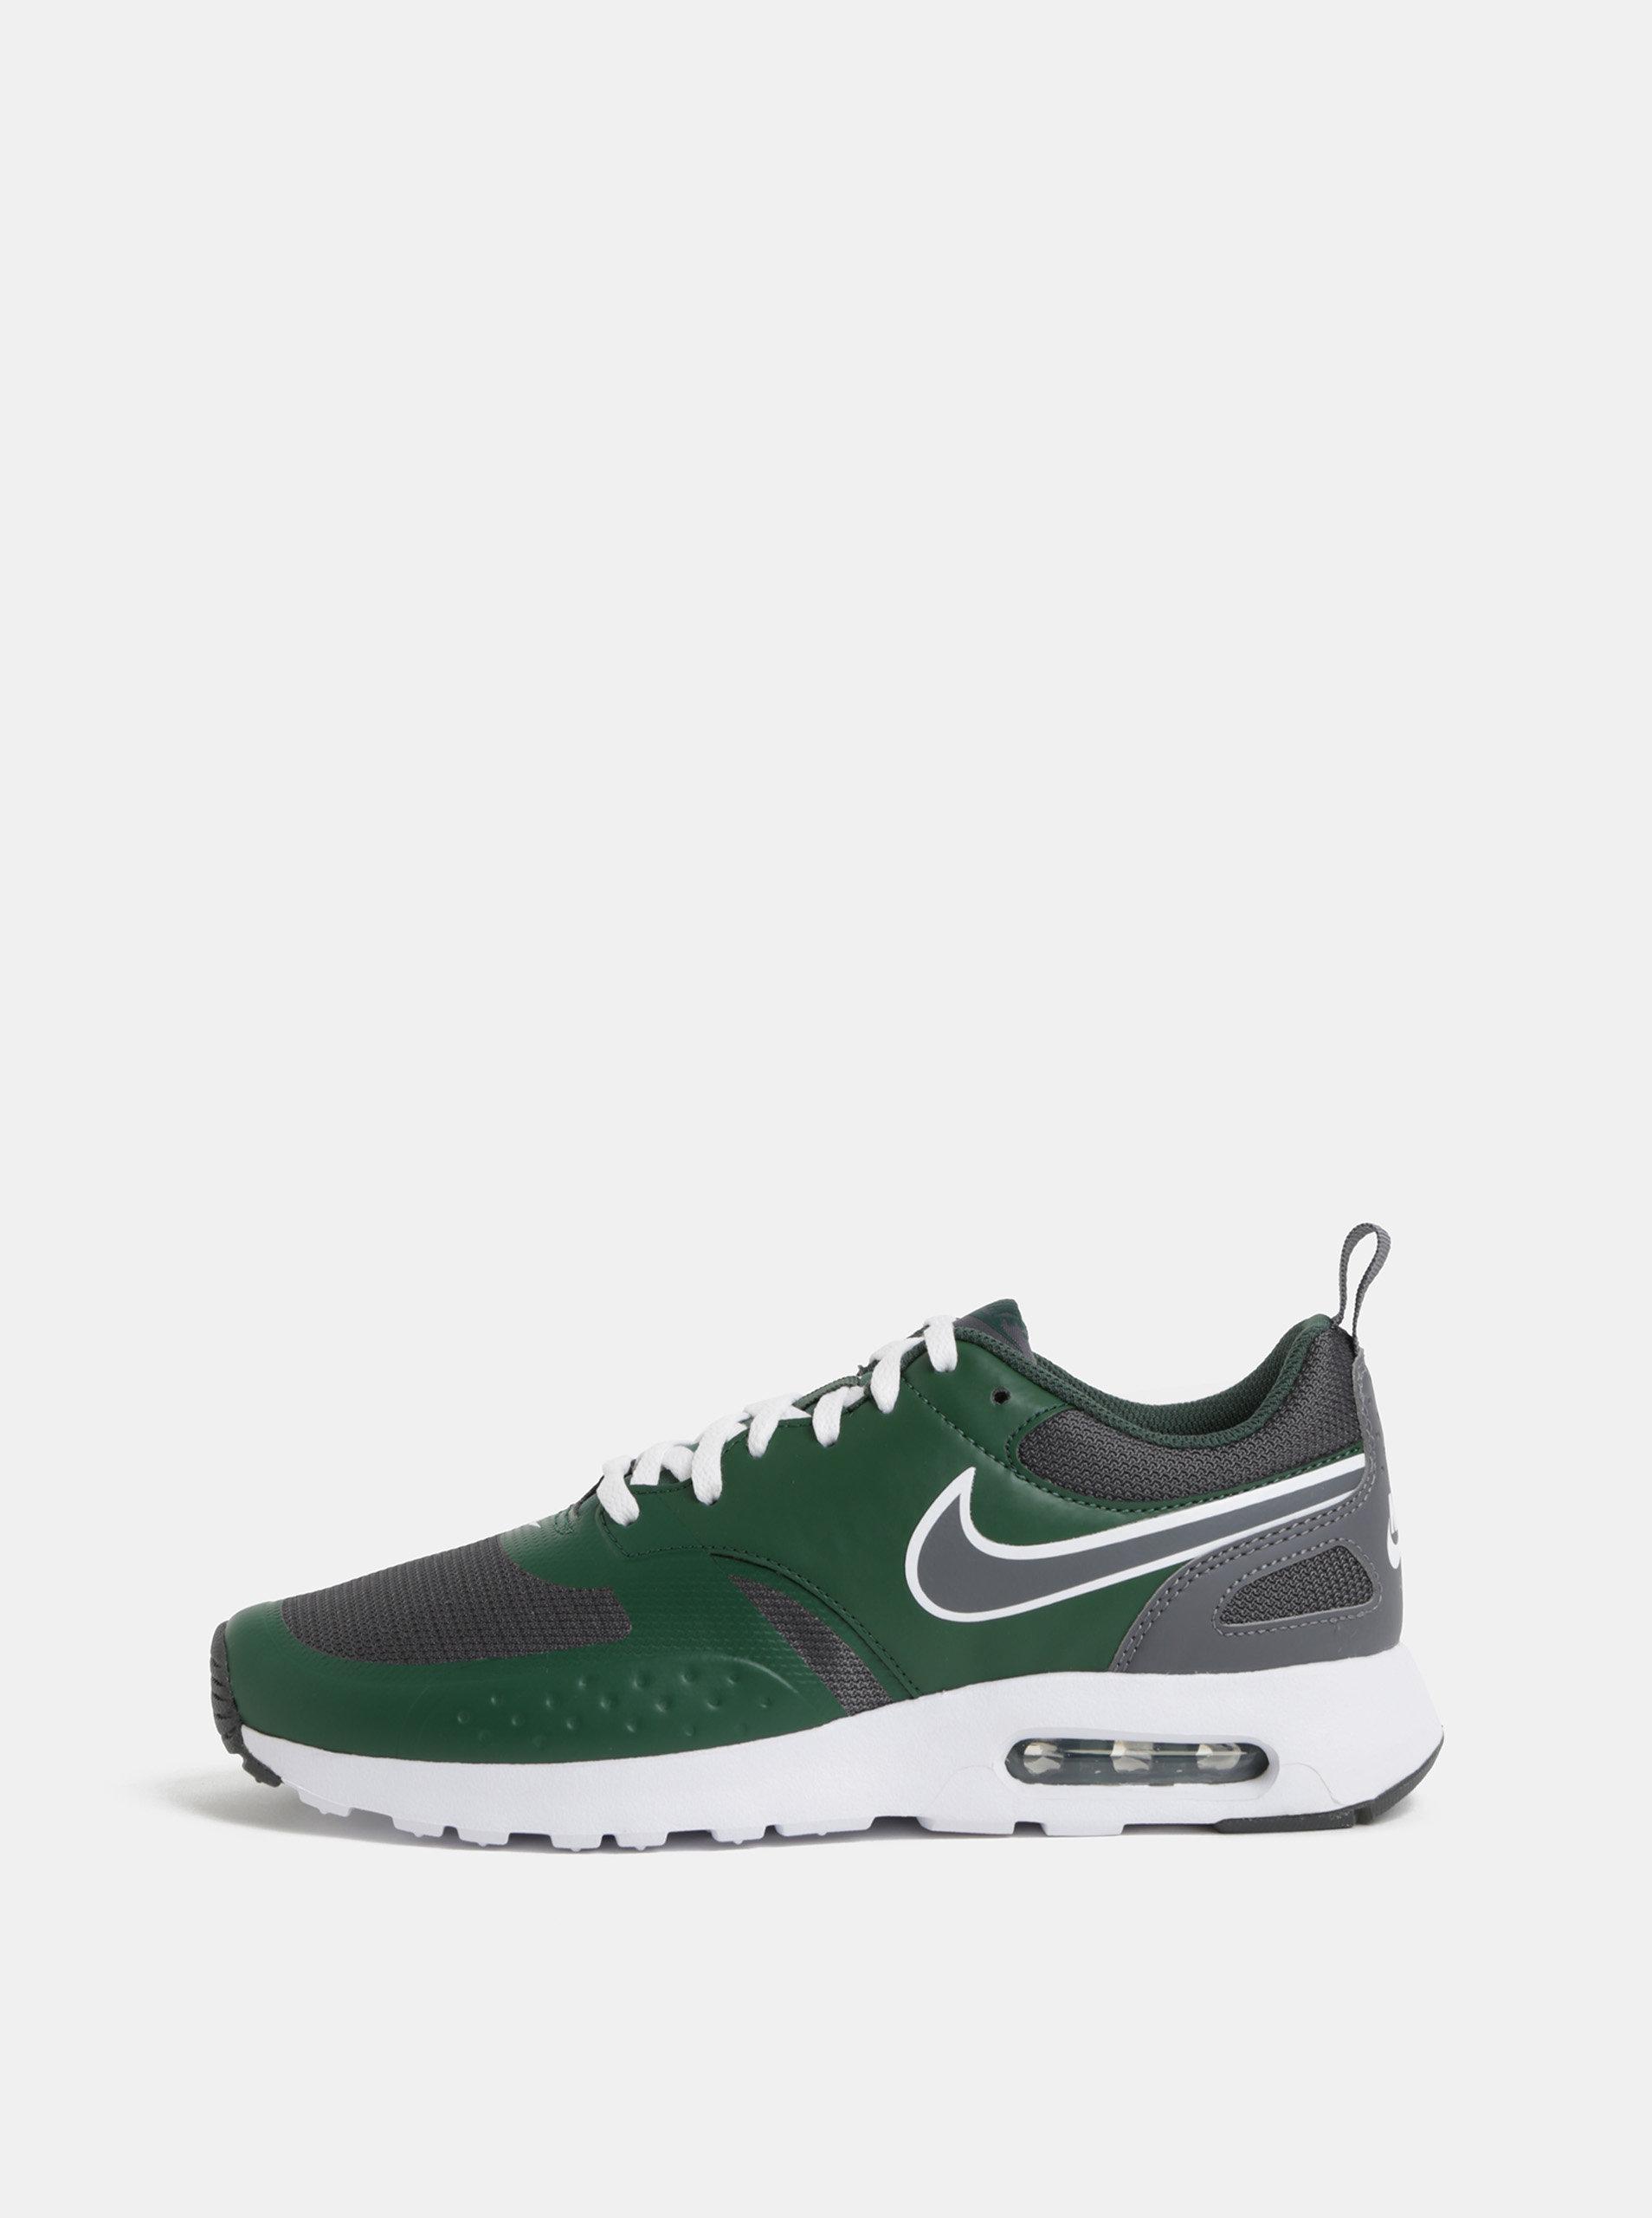 Šedo-zelené pánské tenisky Nike Air Max Vision Shoe